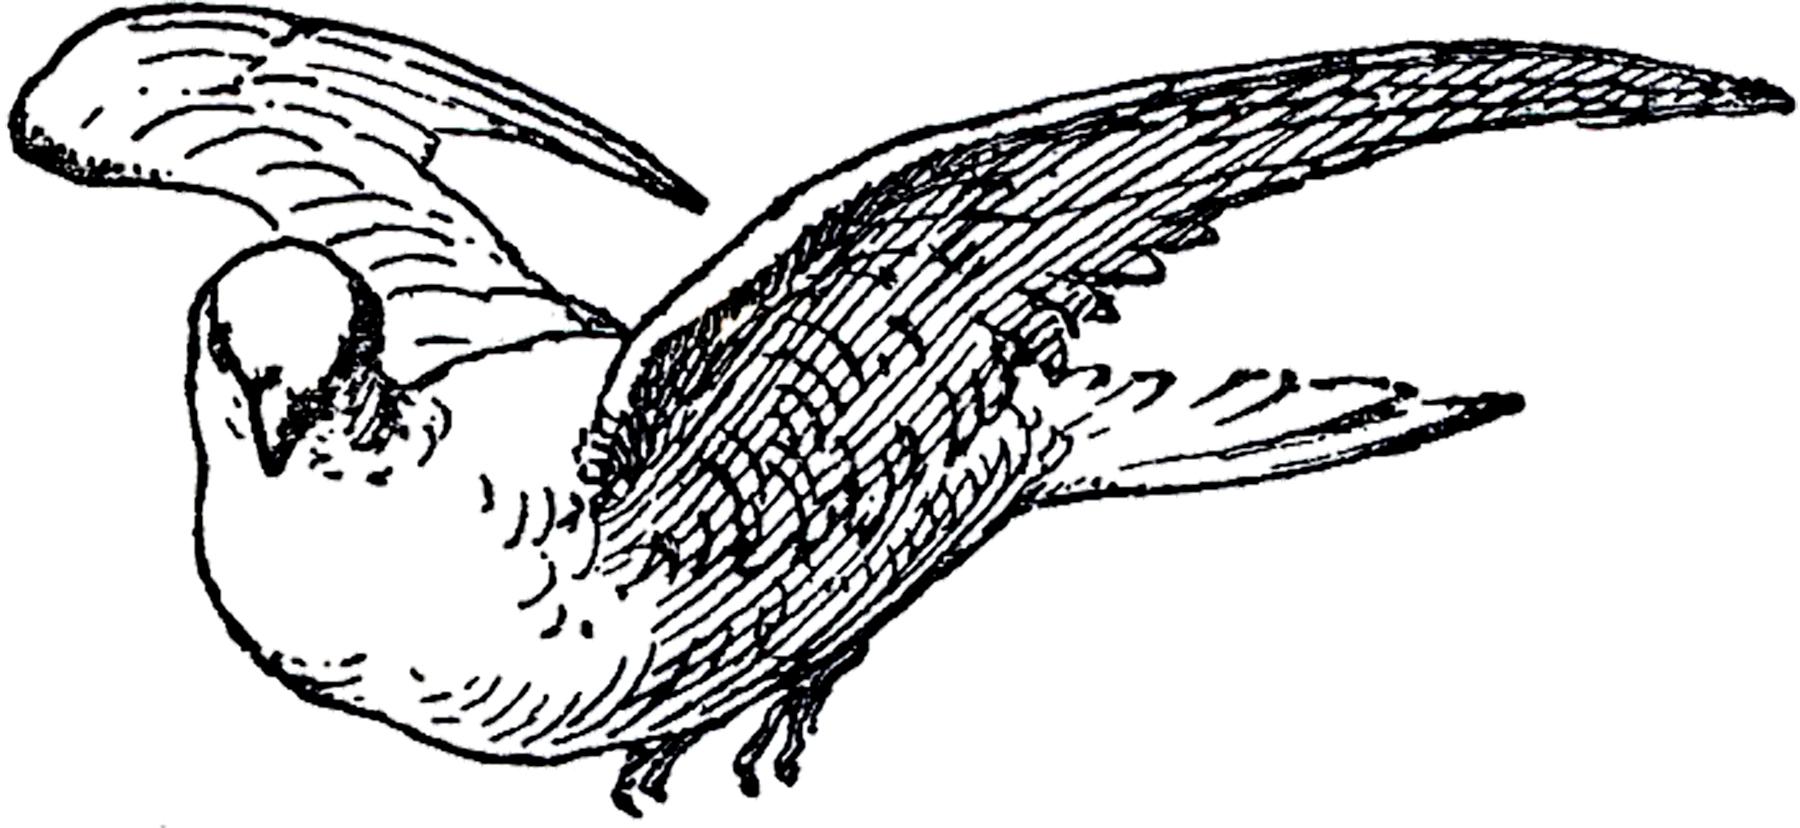 Line Art Photo : Free dove line art the graphics fairy